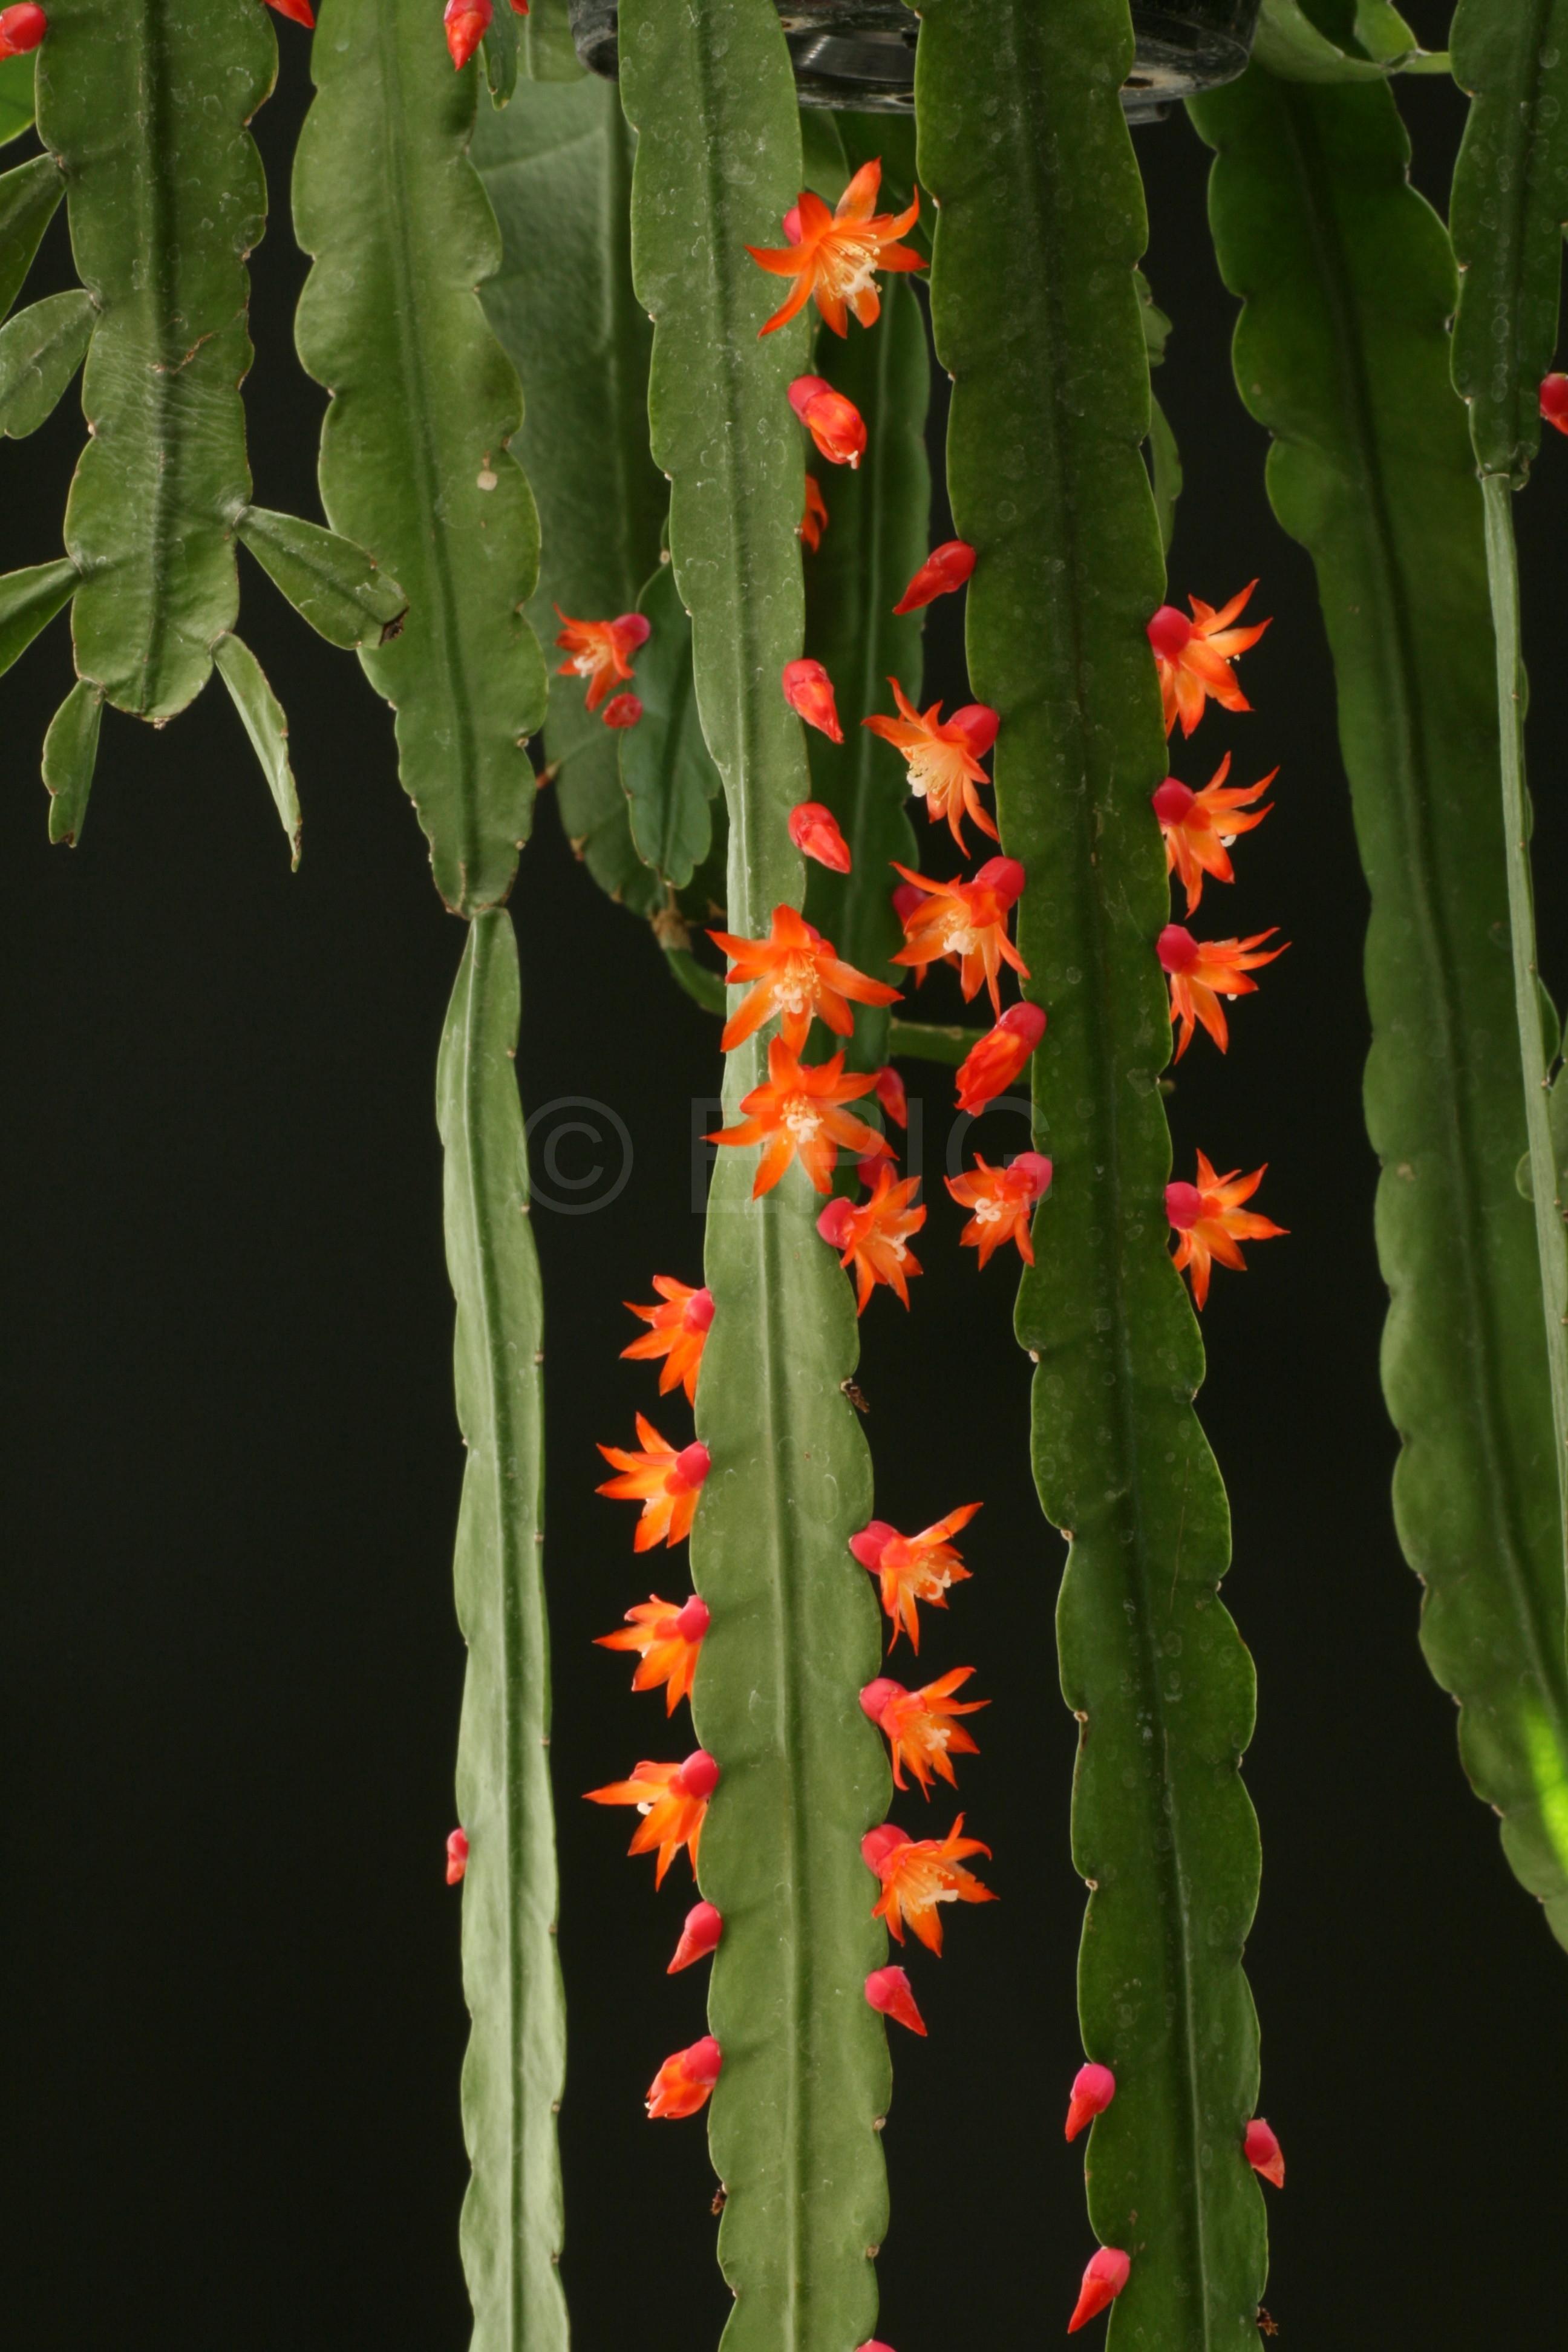 Pfeiffera monacantha ssp. kimnachii (Foto Jochen Bockemühl)